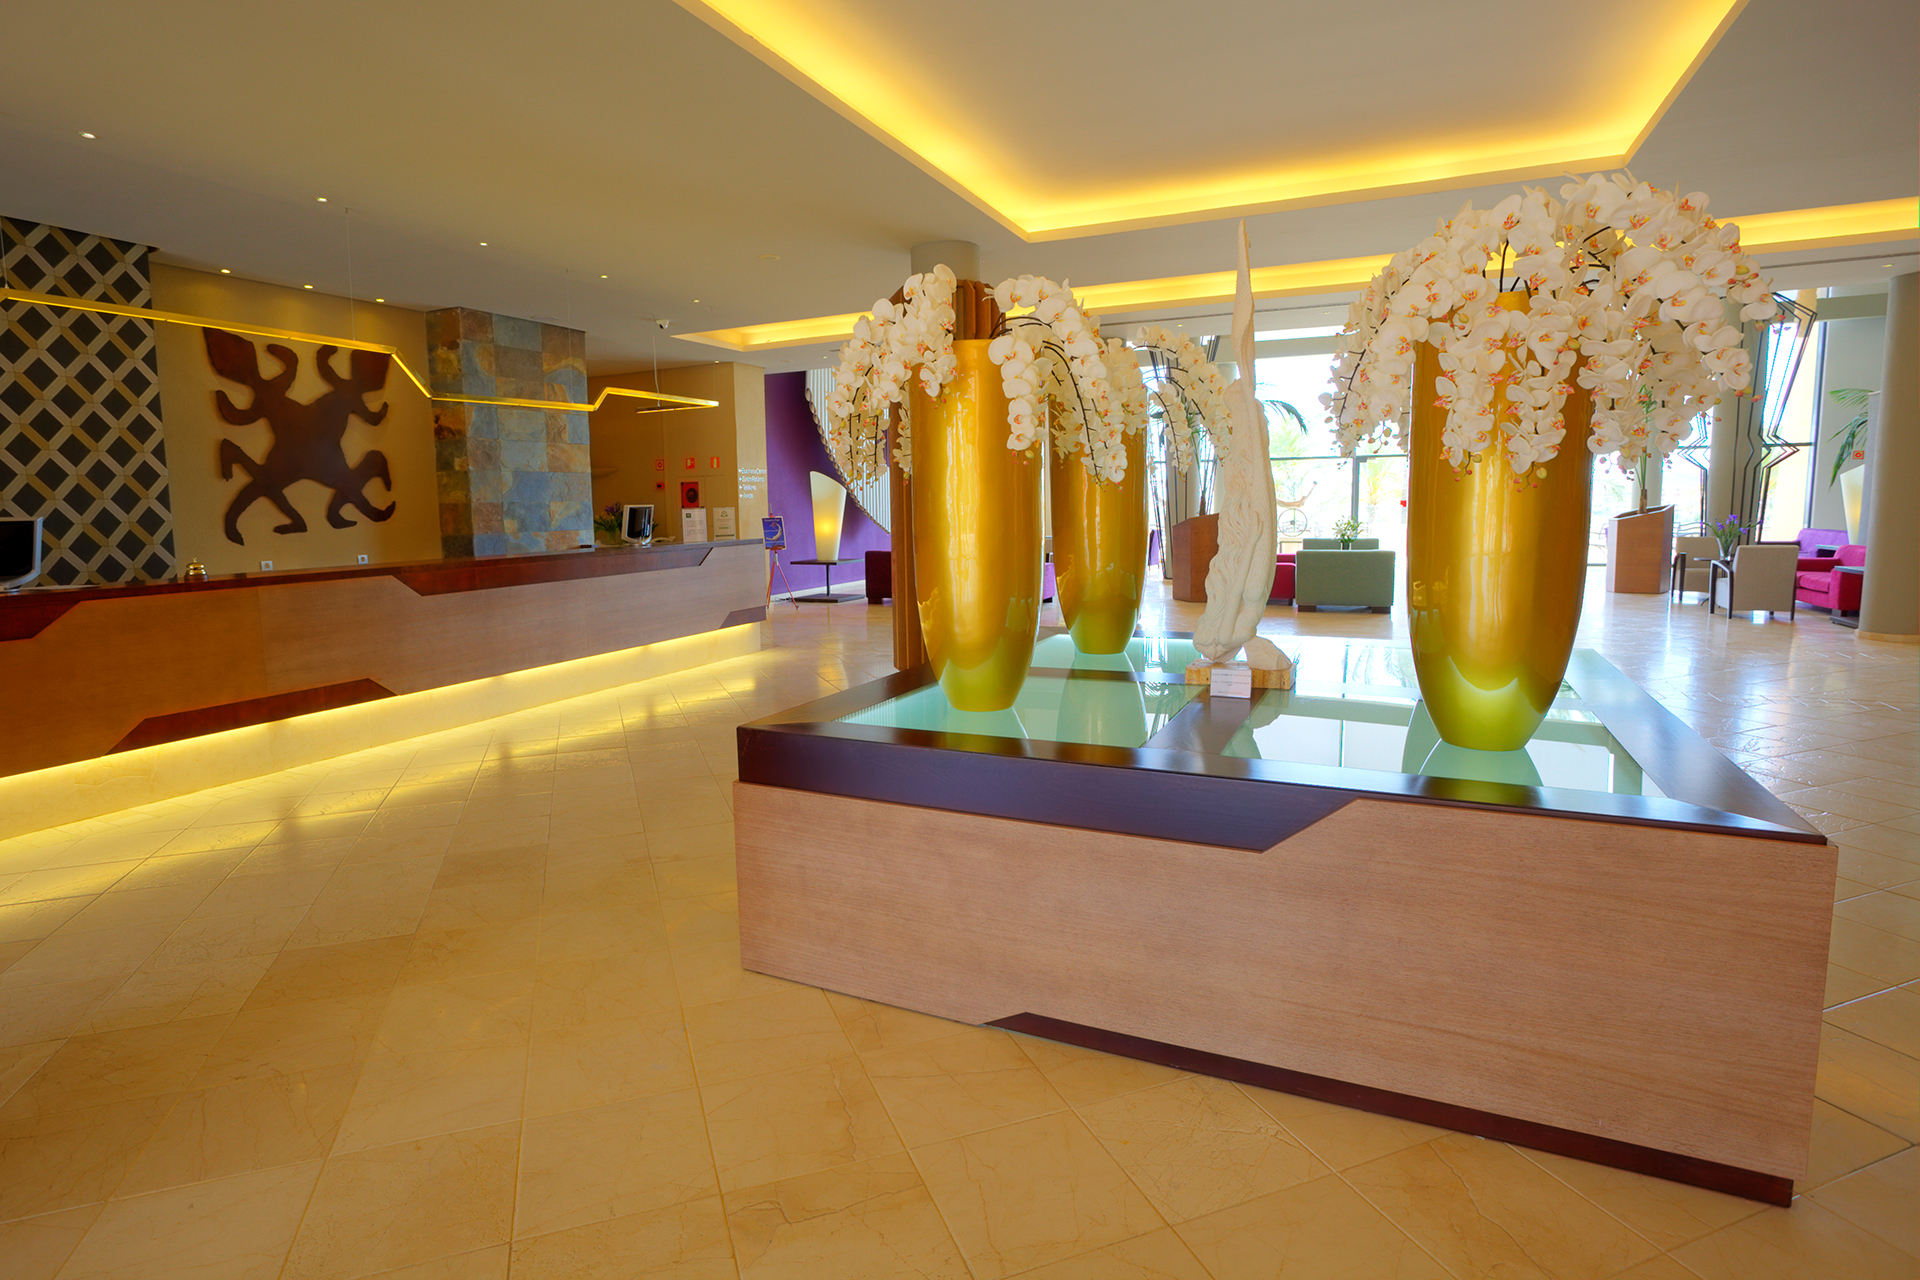 Golf-Expedition-Golf-reizen-Spanje-Regio-Valencia-Valle-Del-este-Golf-resort-lobby